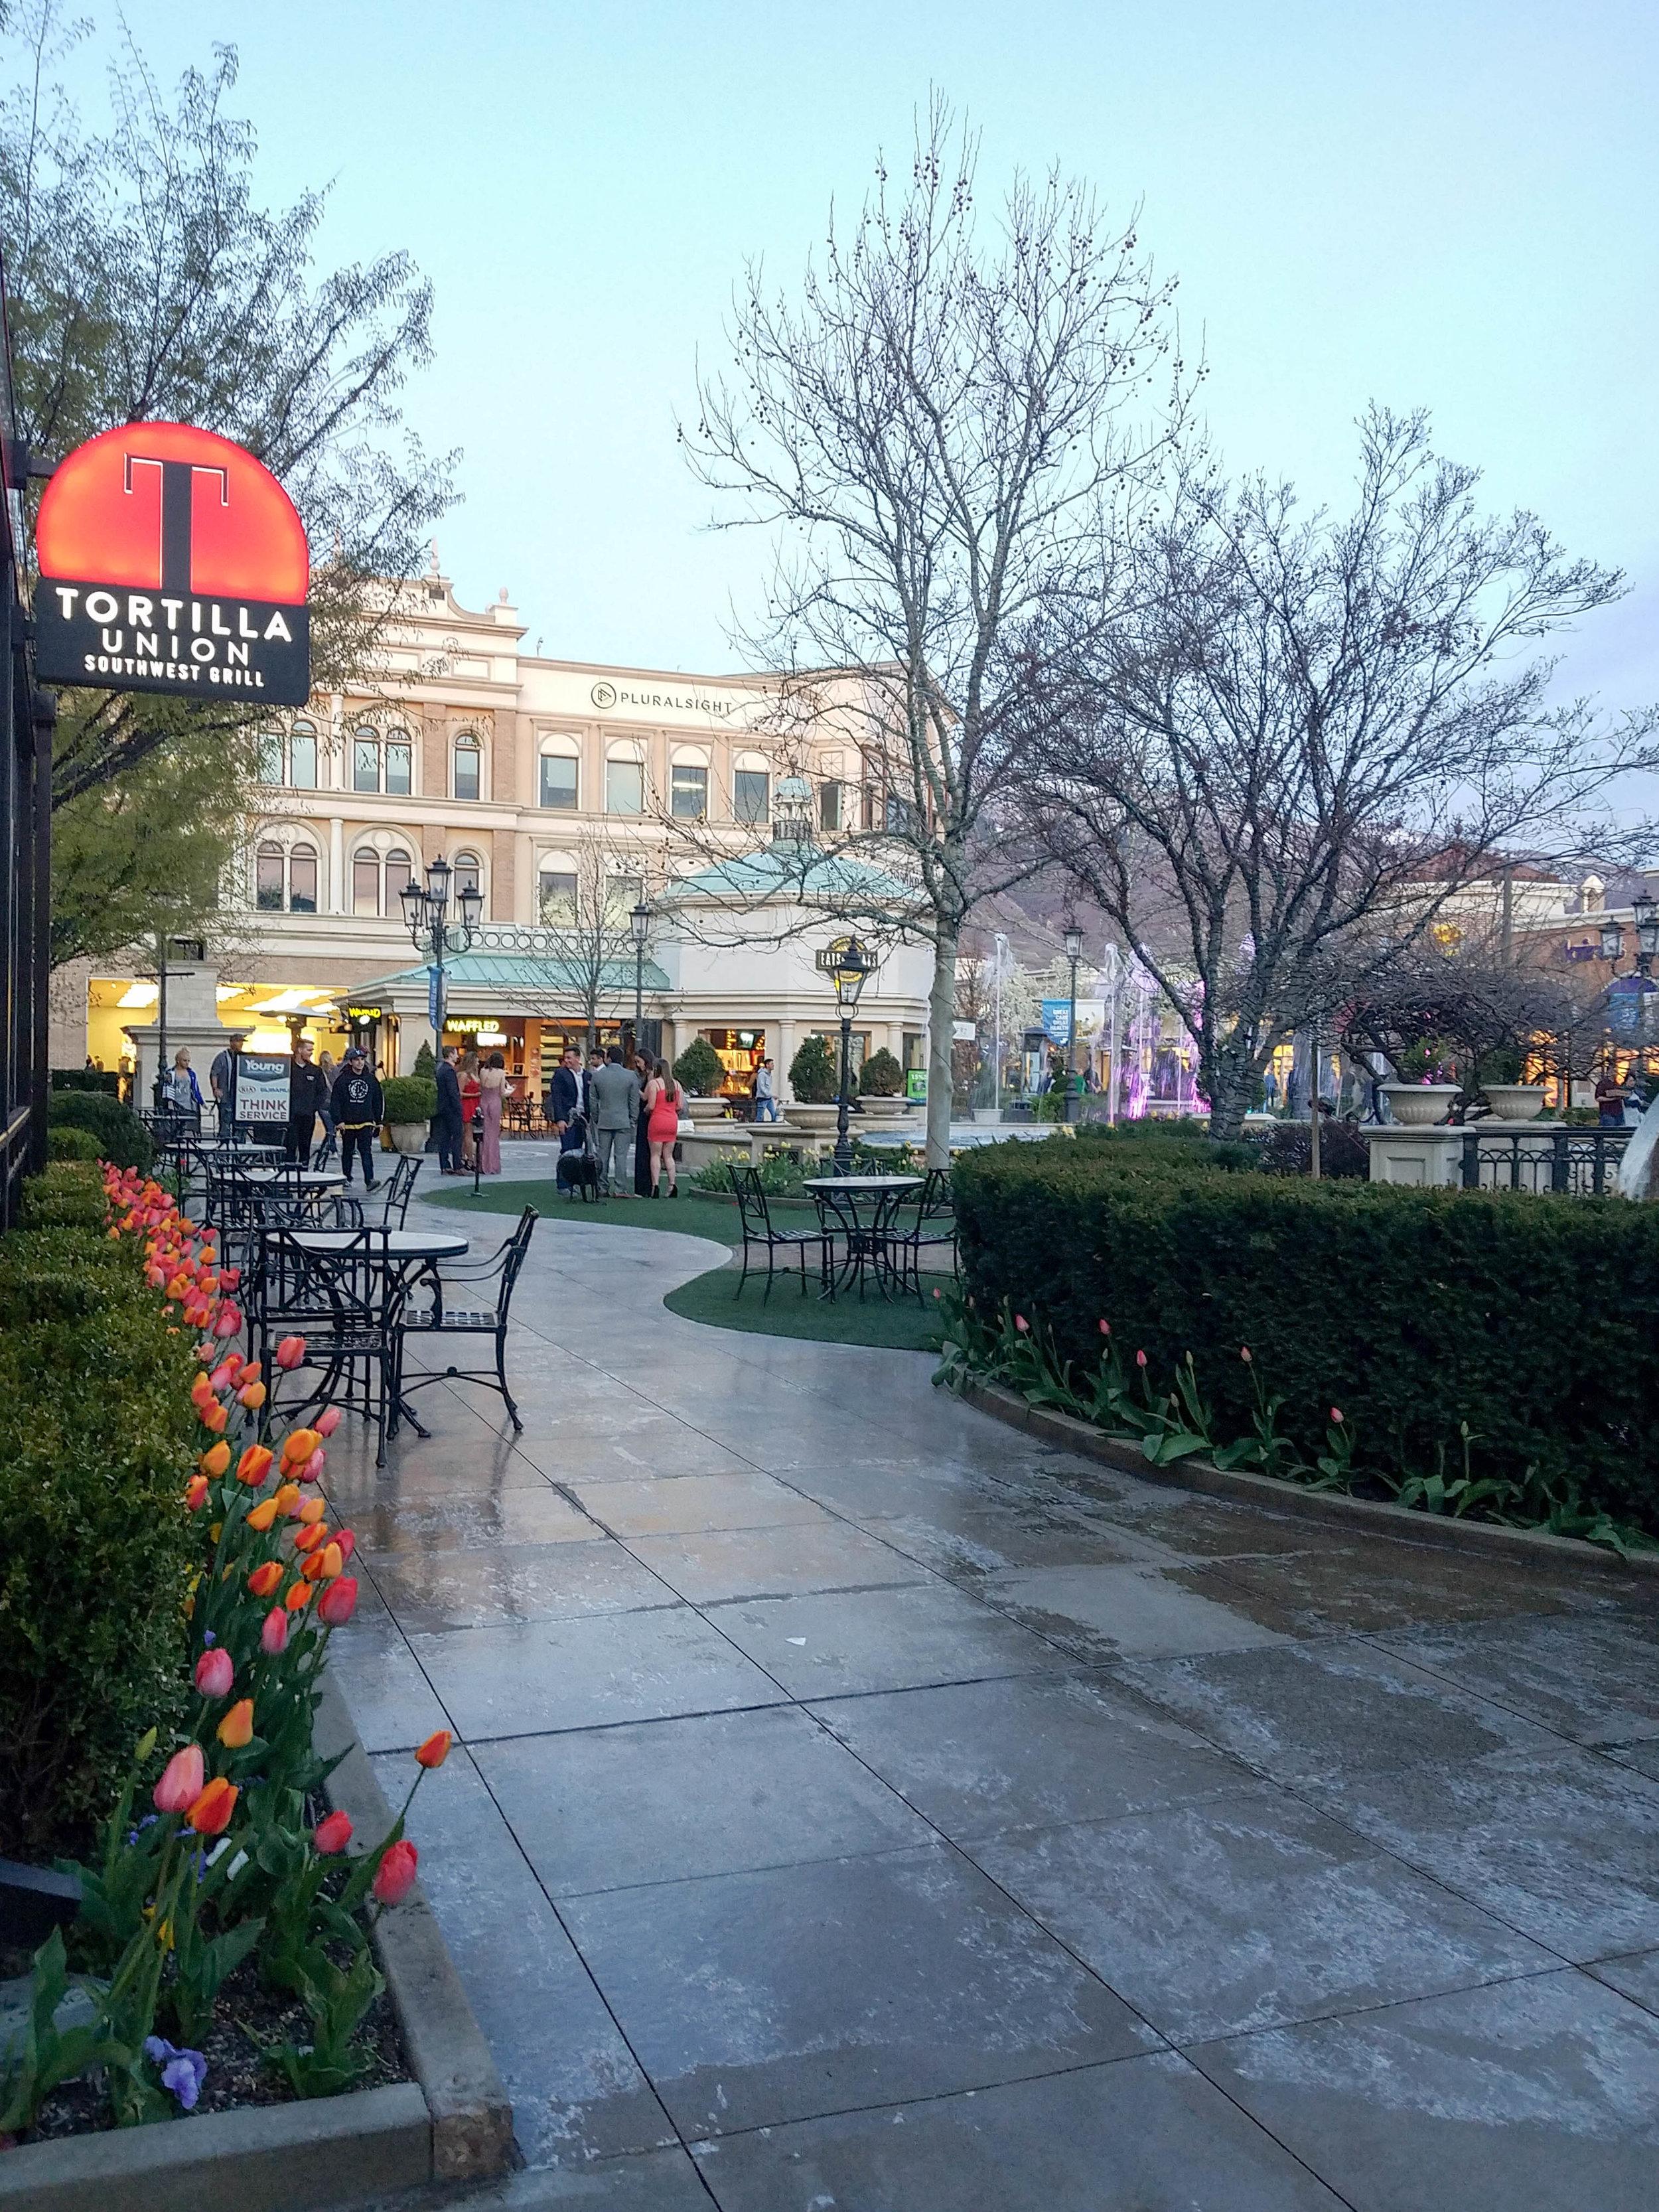 Tortilla Union Station Park Farmington, UT